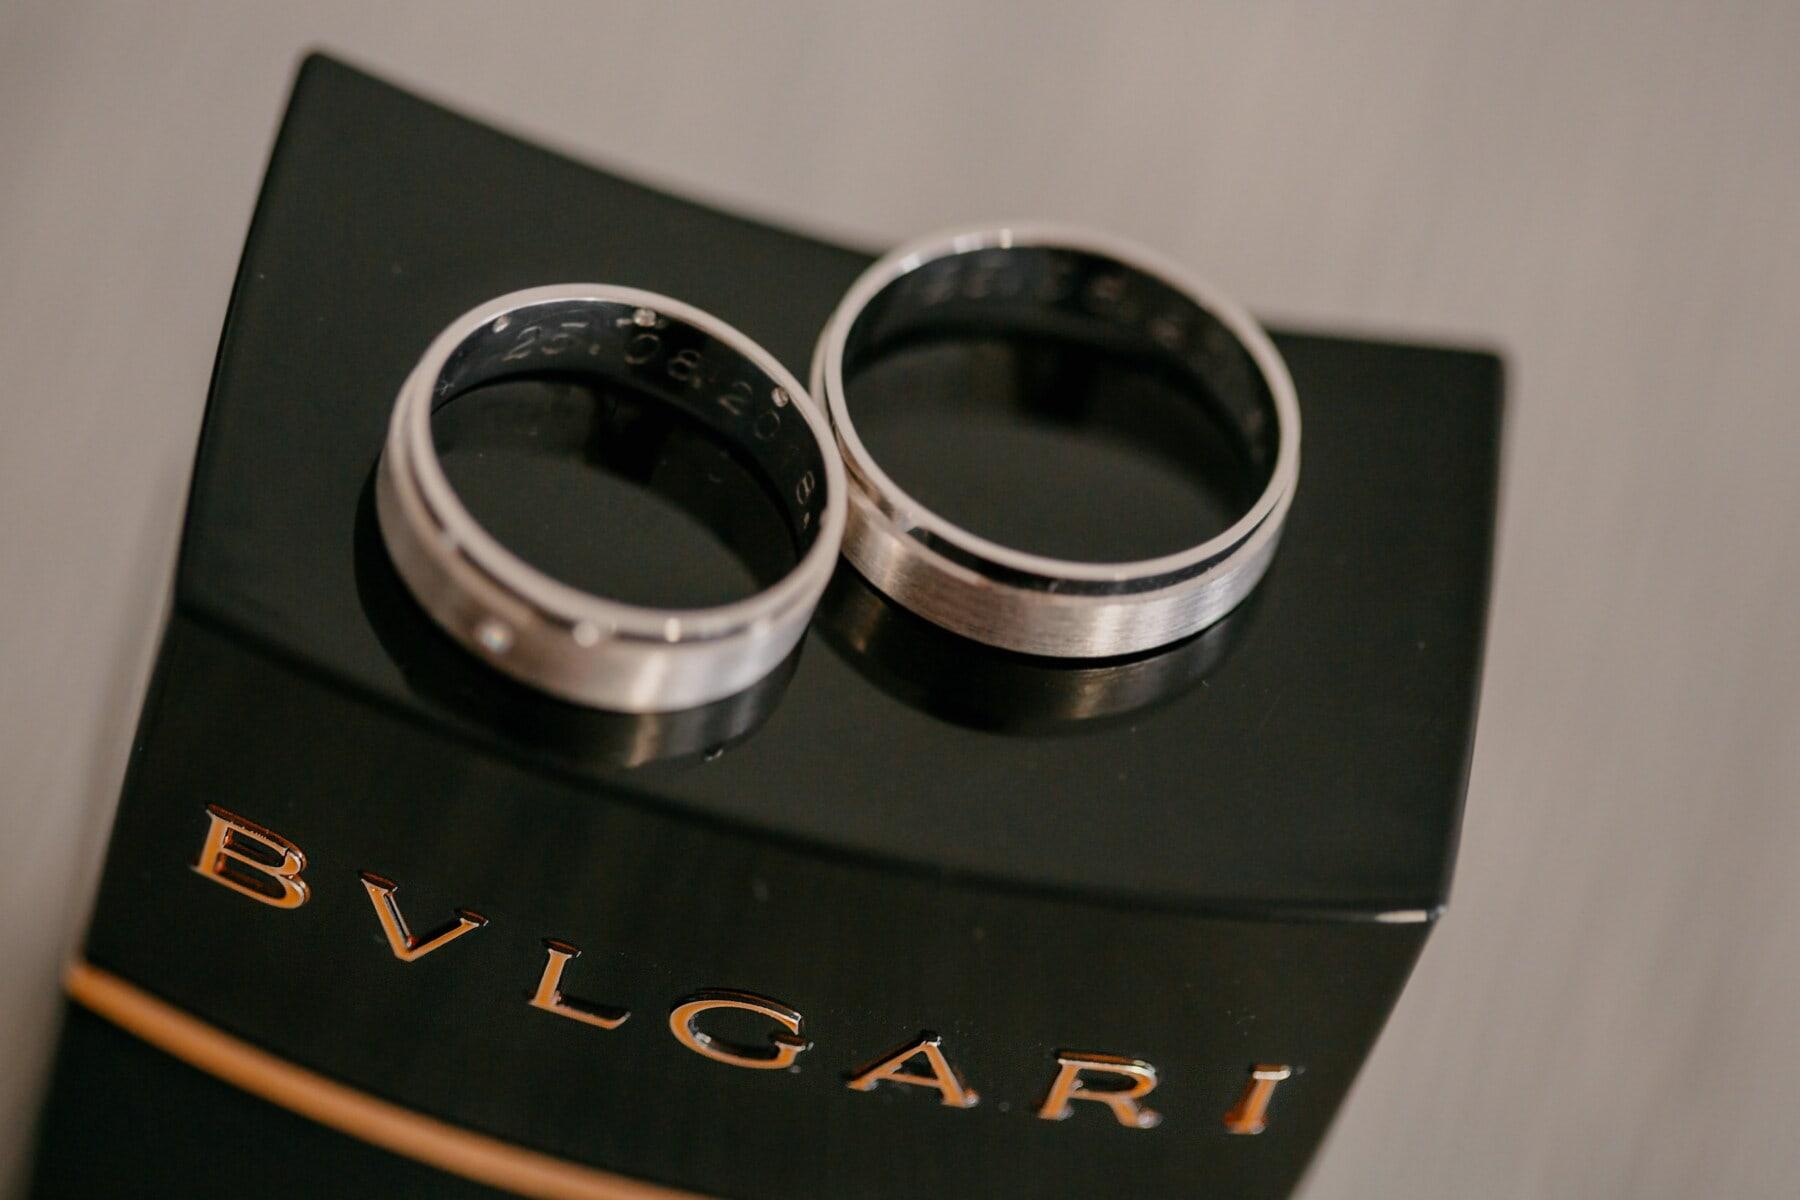 platinum, wedding ring, perfume, famous, expensive, classic, still life, wedding, vintage, black